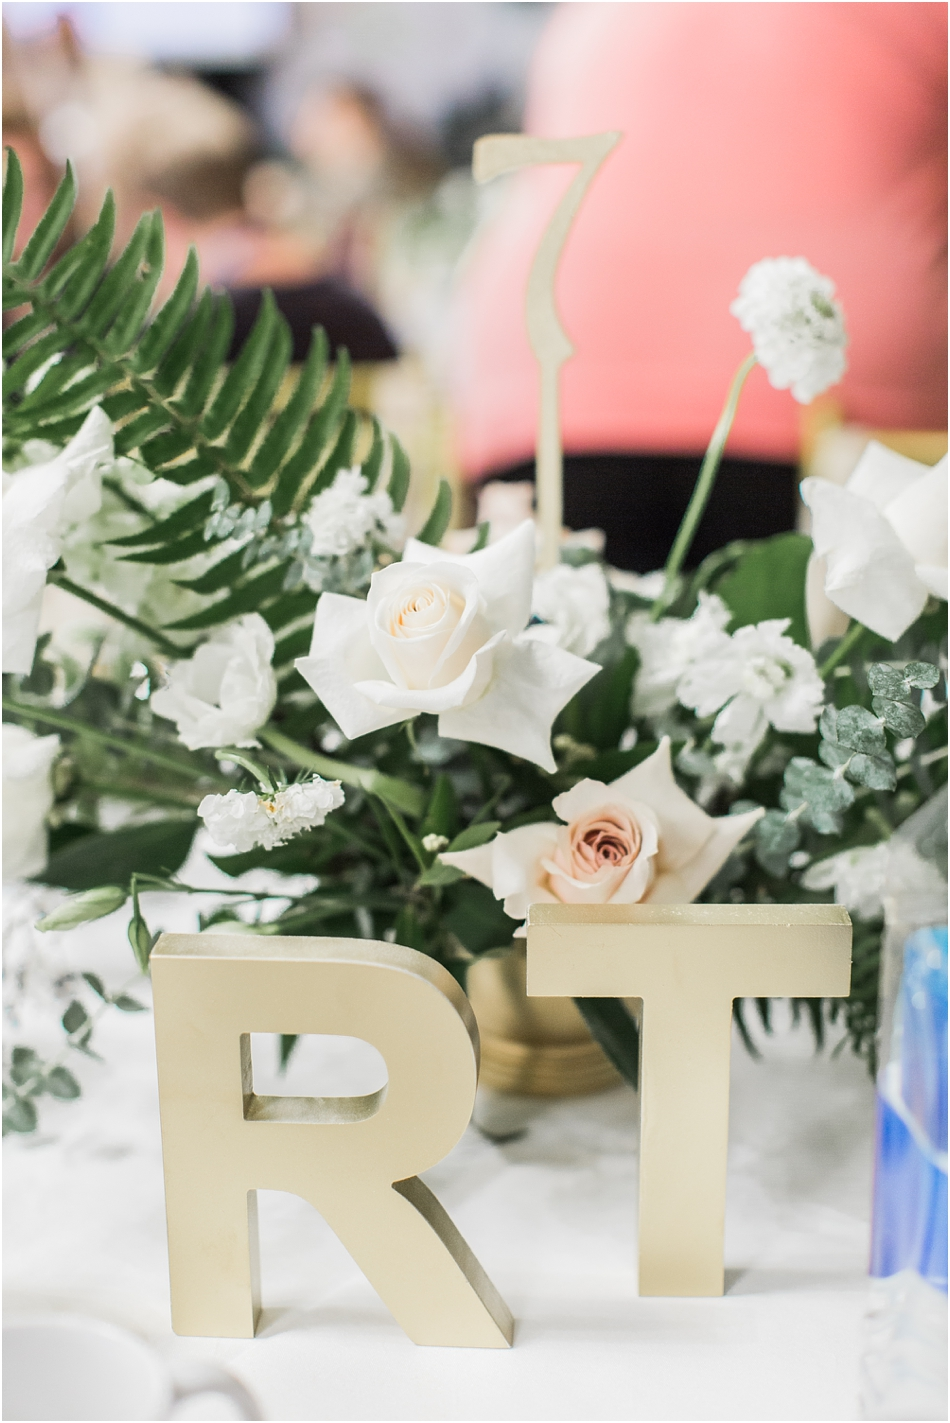 new_orleans_rising_tide_society_nola_louisiana_leader_cape_cod_boston_new_england_wedding_photographer_Meredith_Jane_Photography_photo_0459.jpg